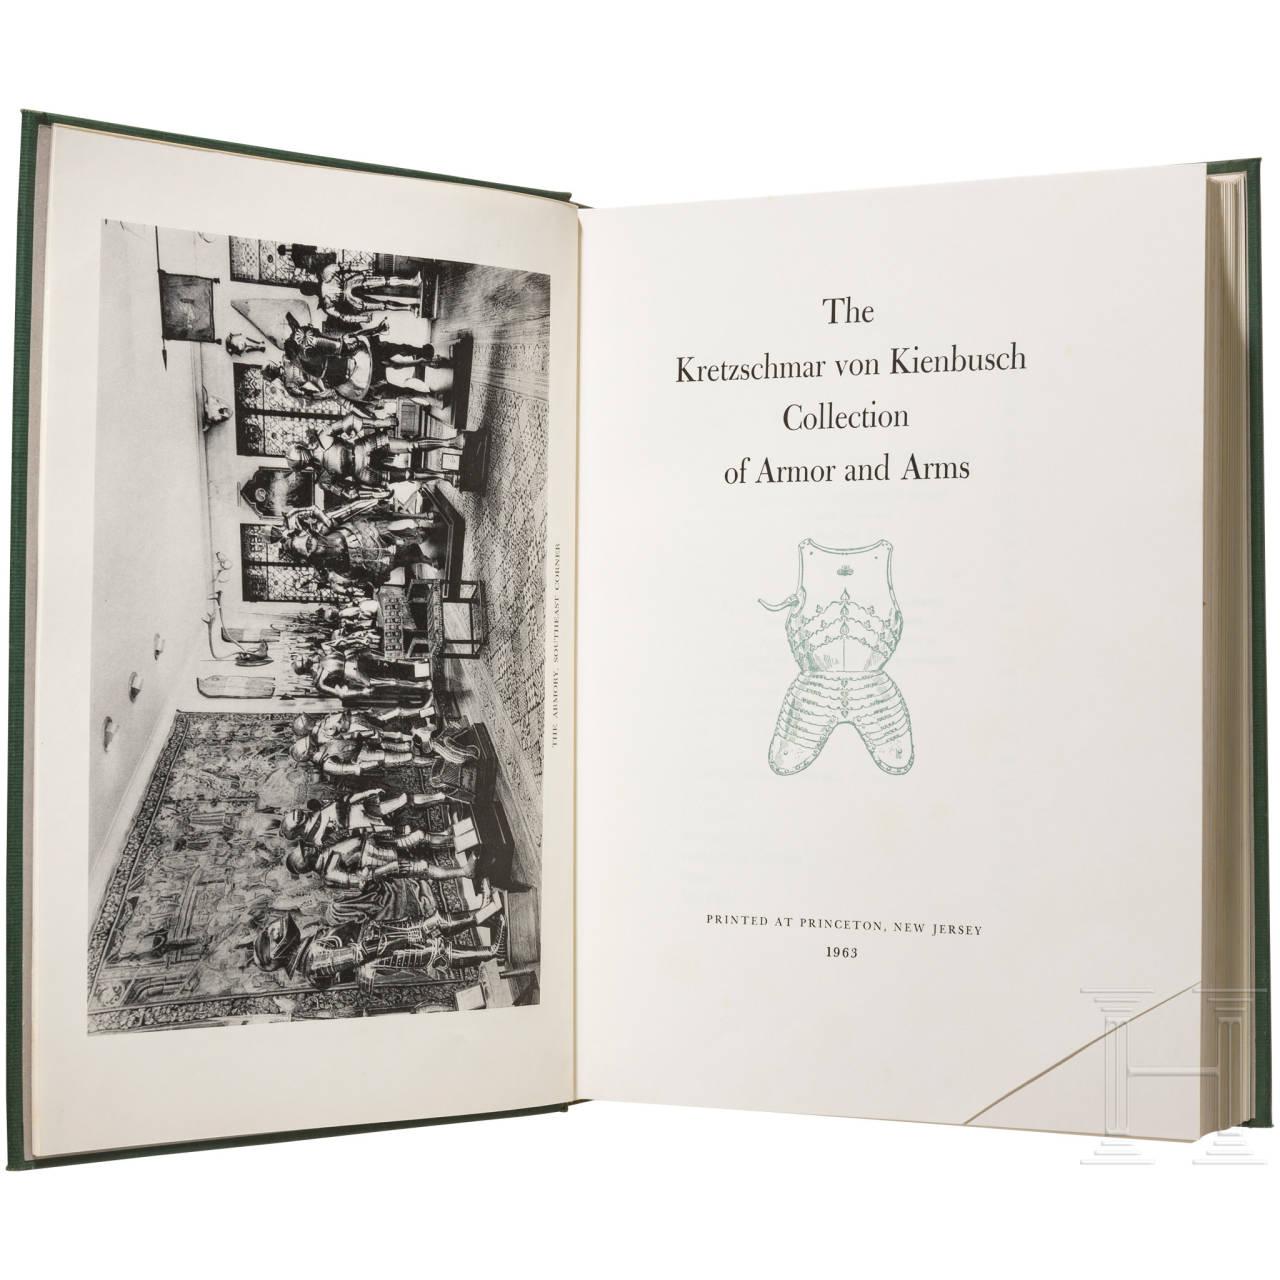 The Kretzschmar von Kienbusch Collection of Armor and Arms, New Jersey 1963